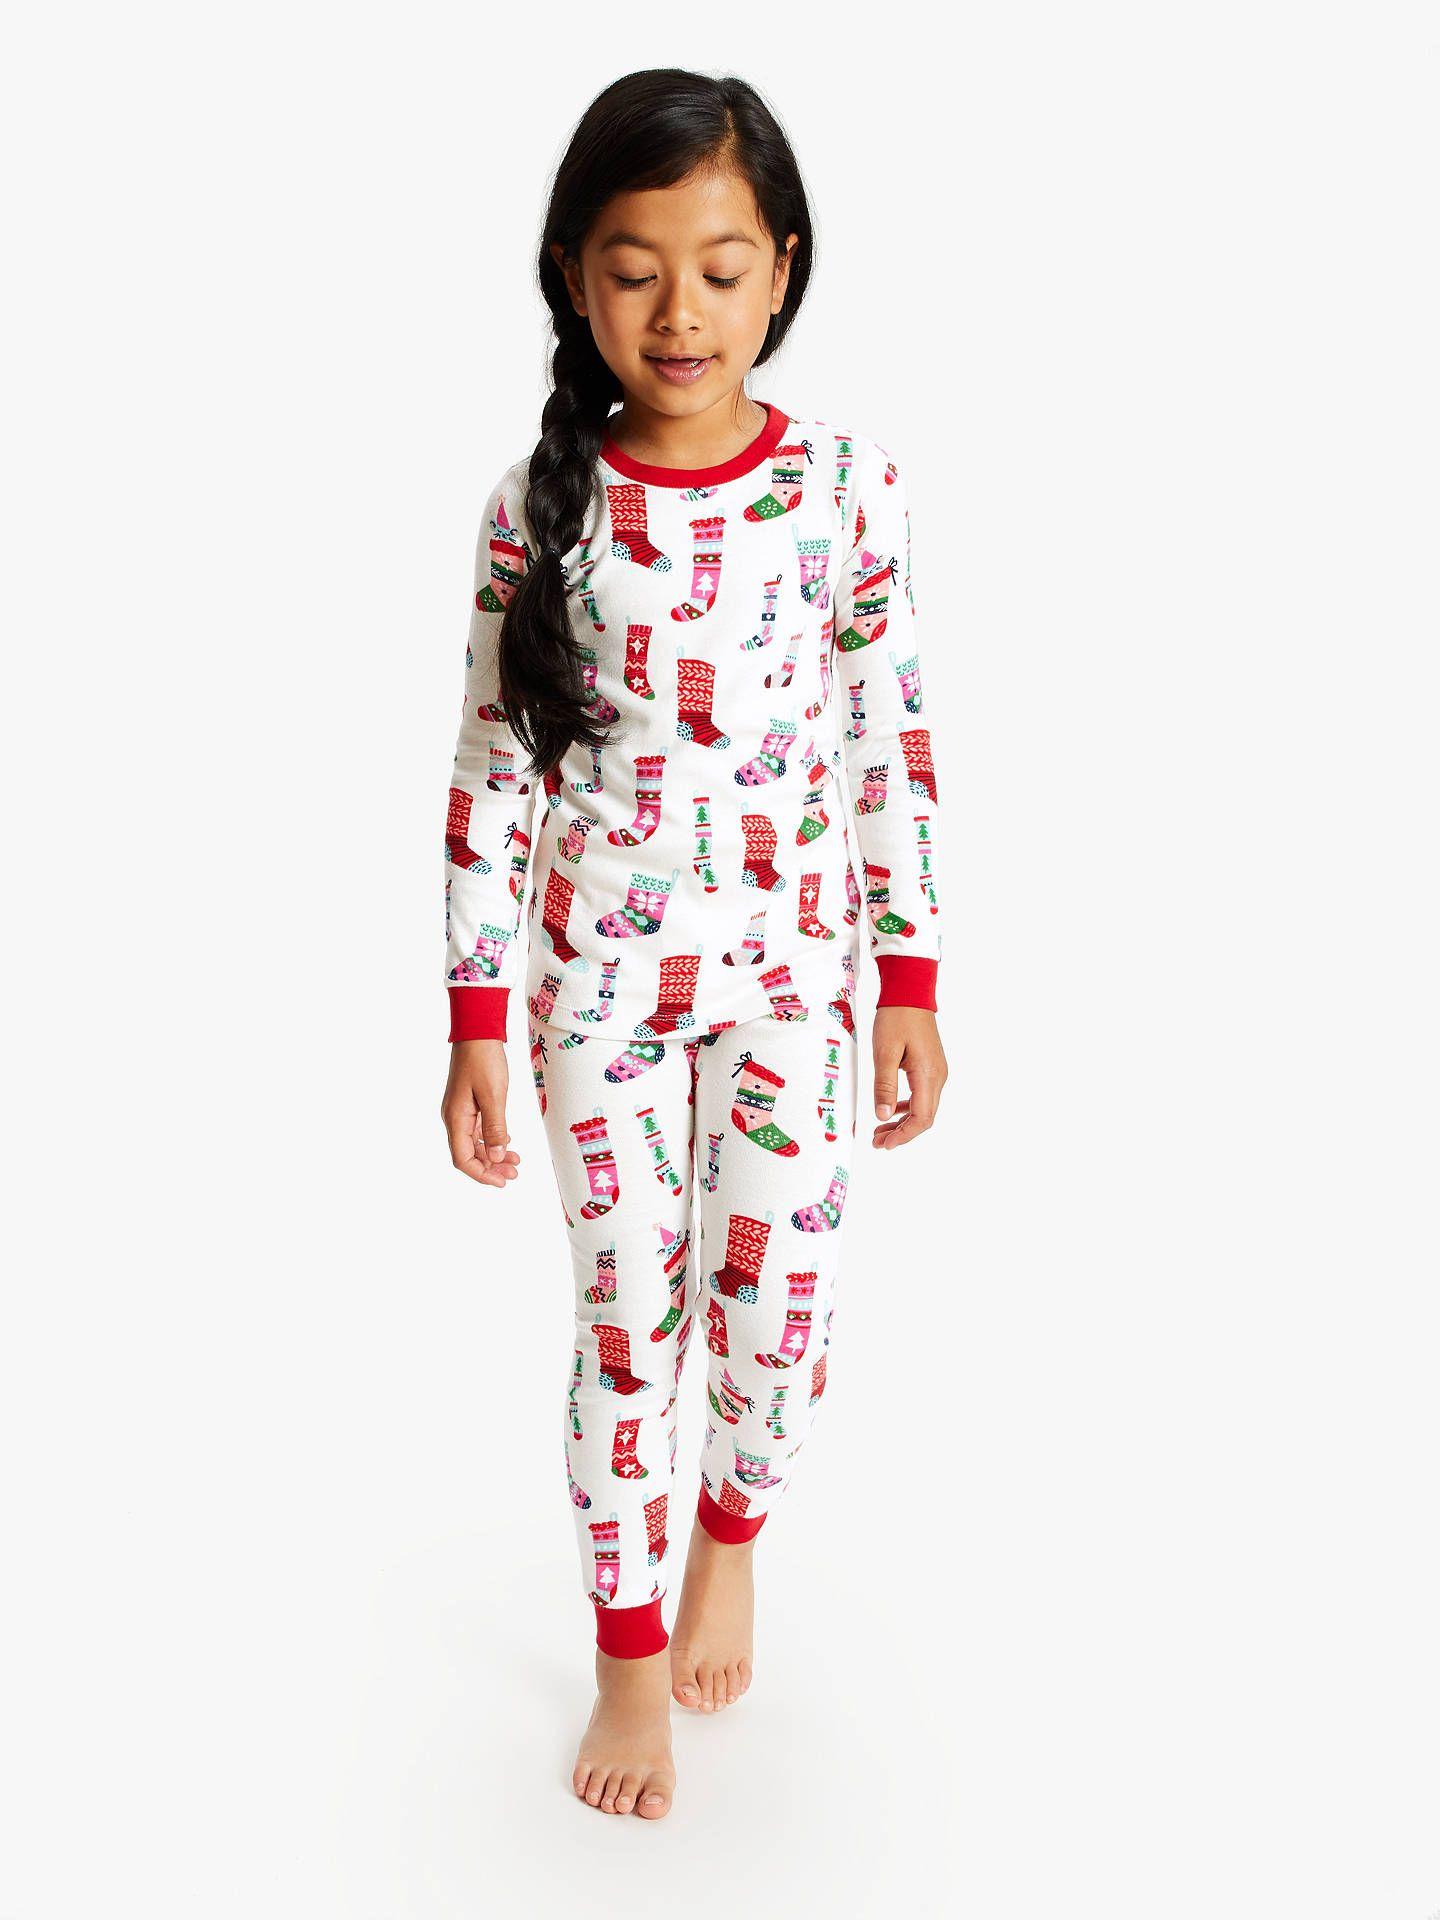 Hatley Girls' Holiday Stockings Print Pyjamas, White/Multi